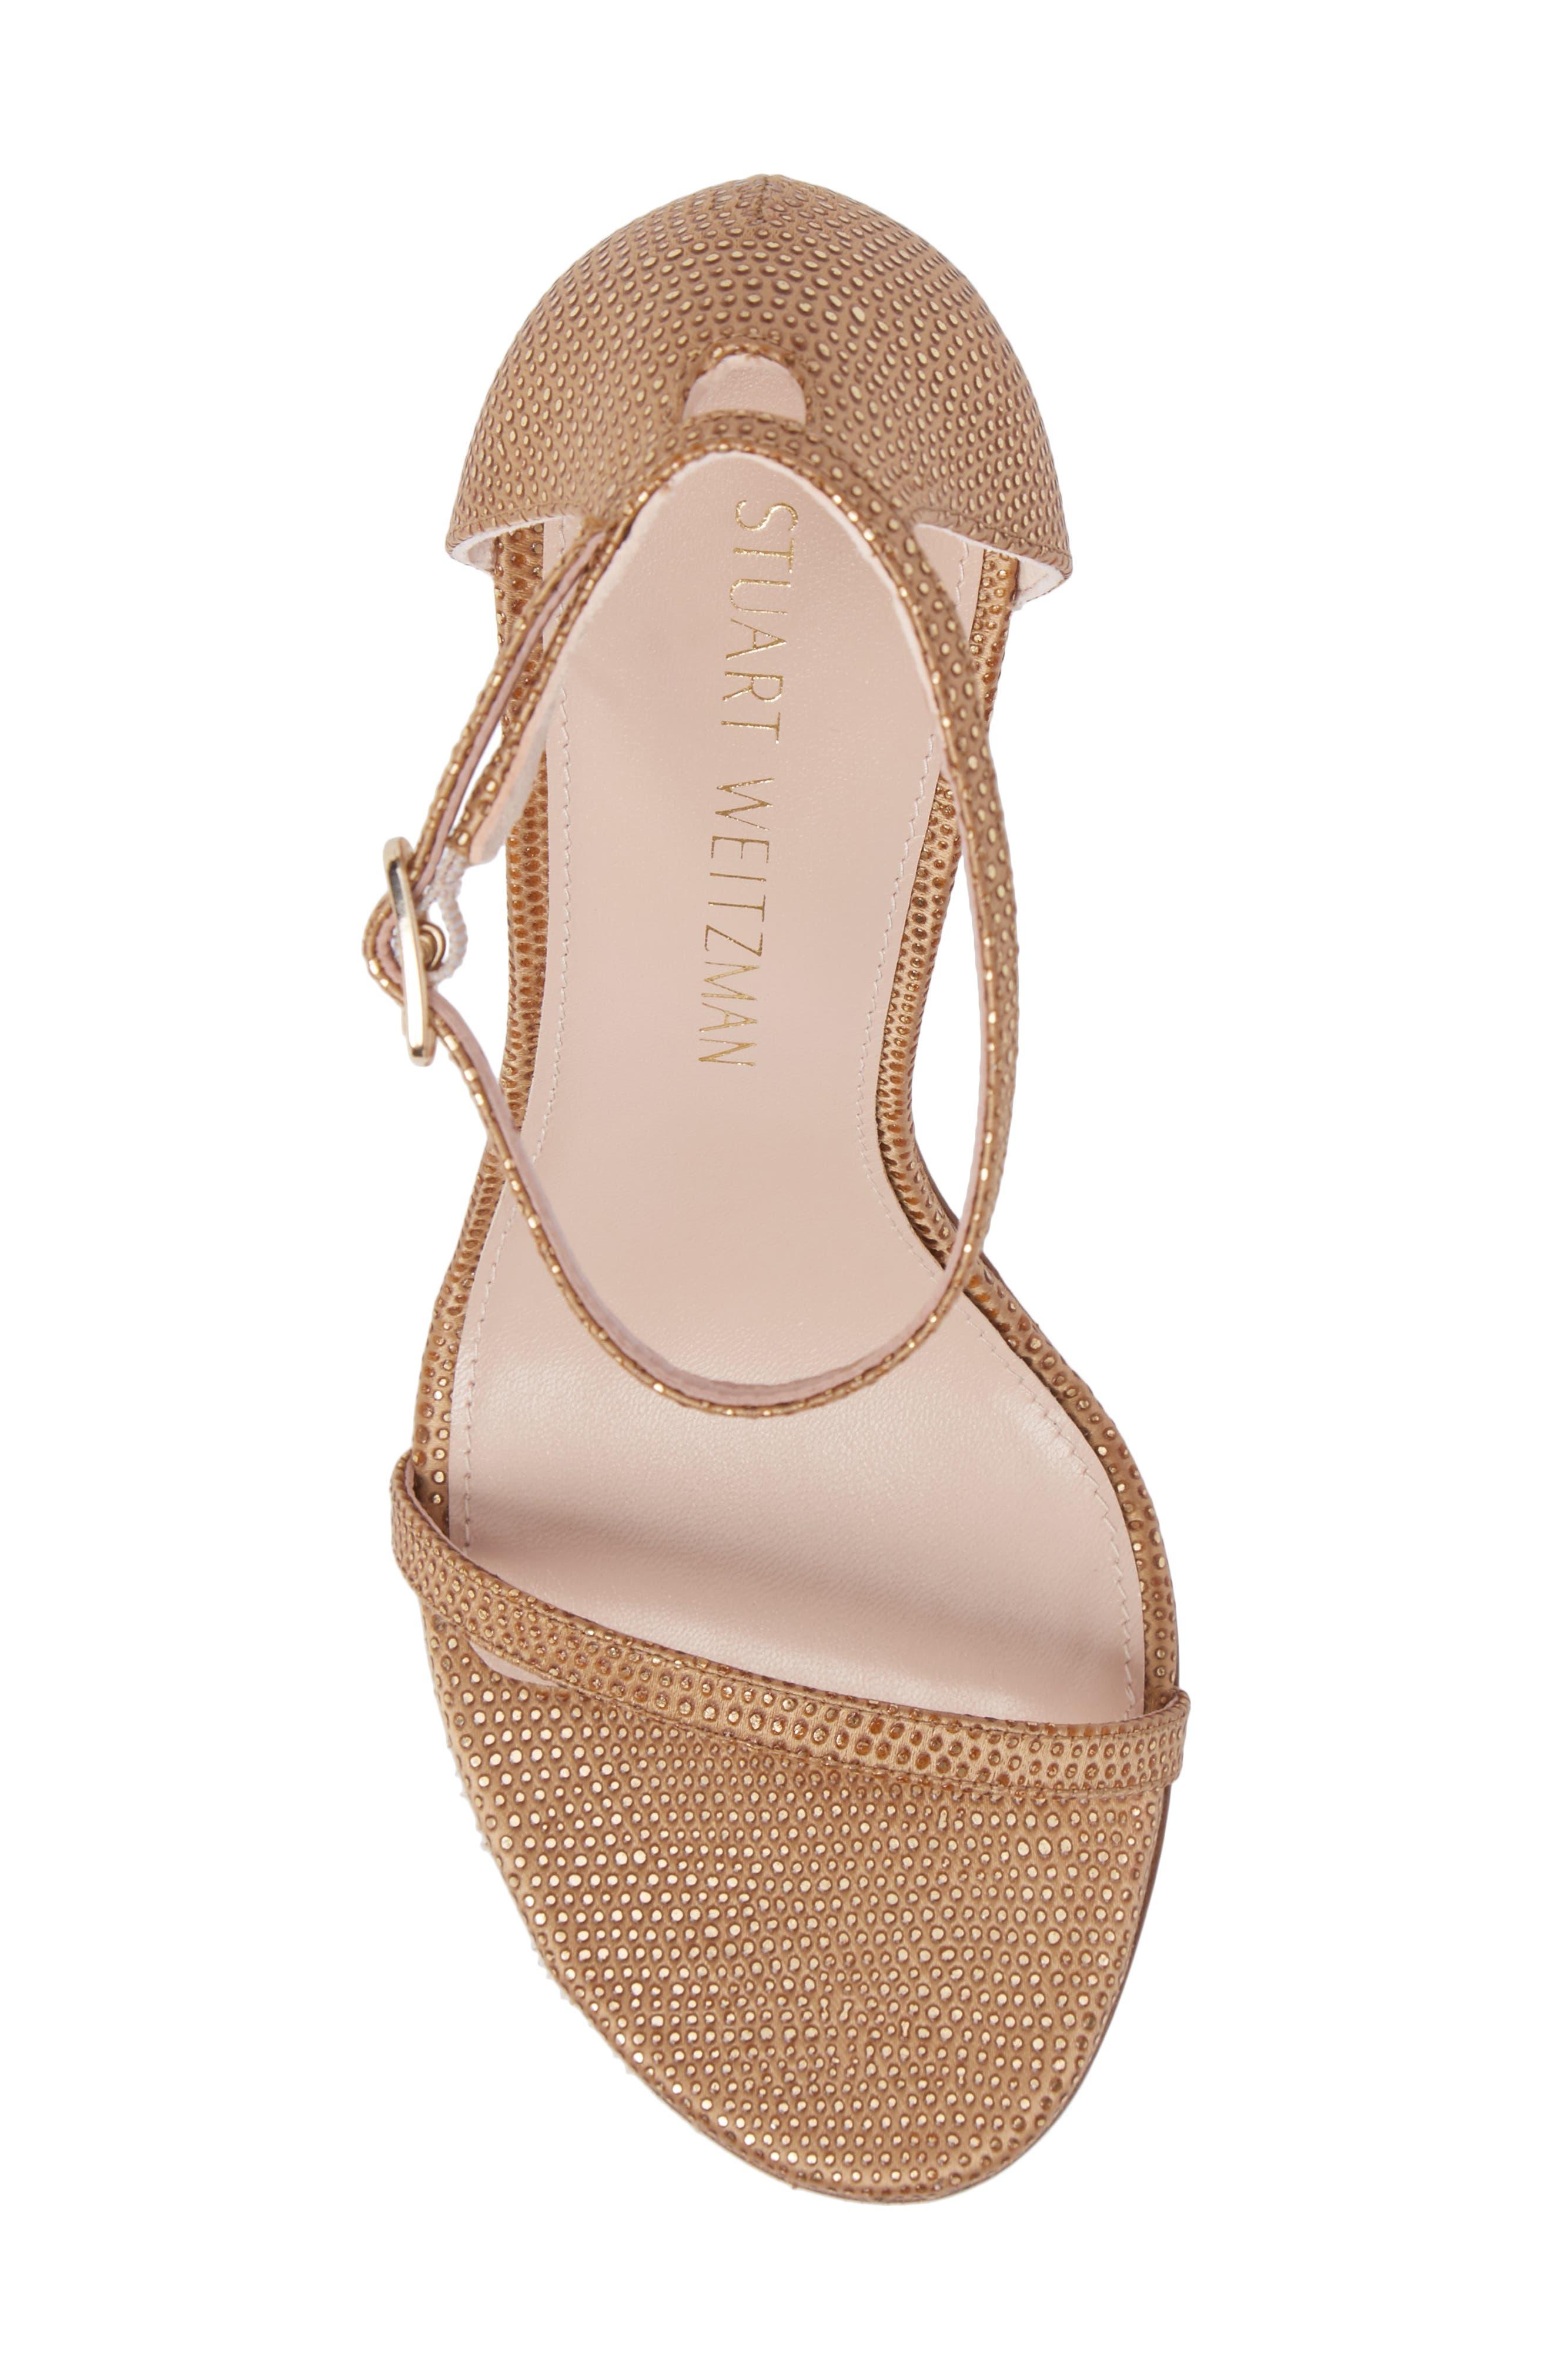 Nudistsong Ankle Strap Sandal,                             Alternate thumbnail 5, color,                             Gold Dot